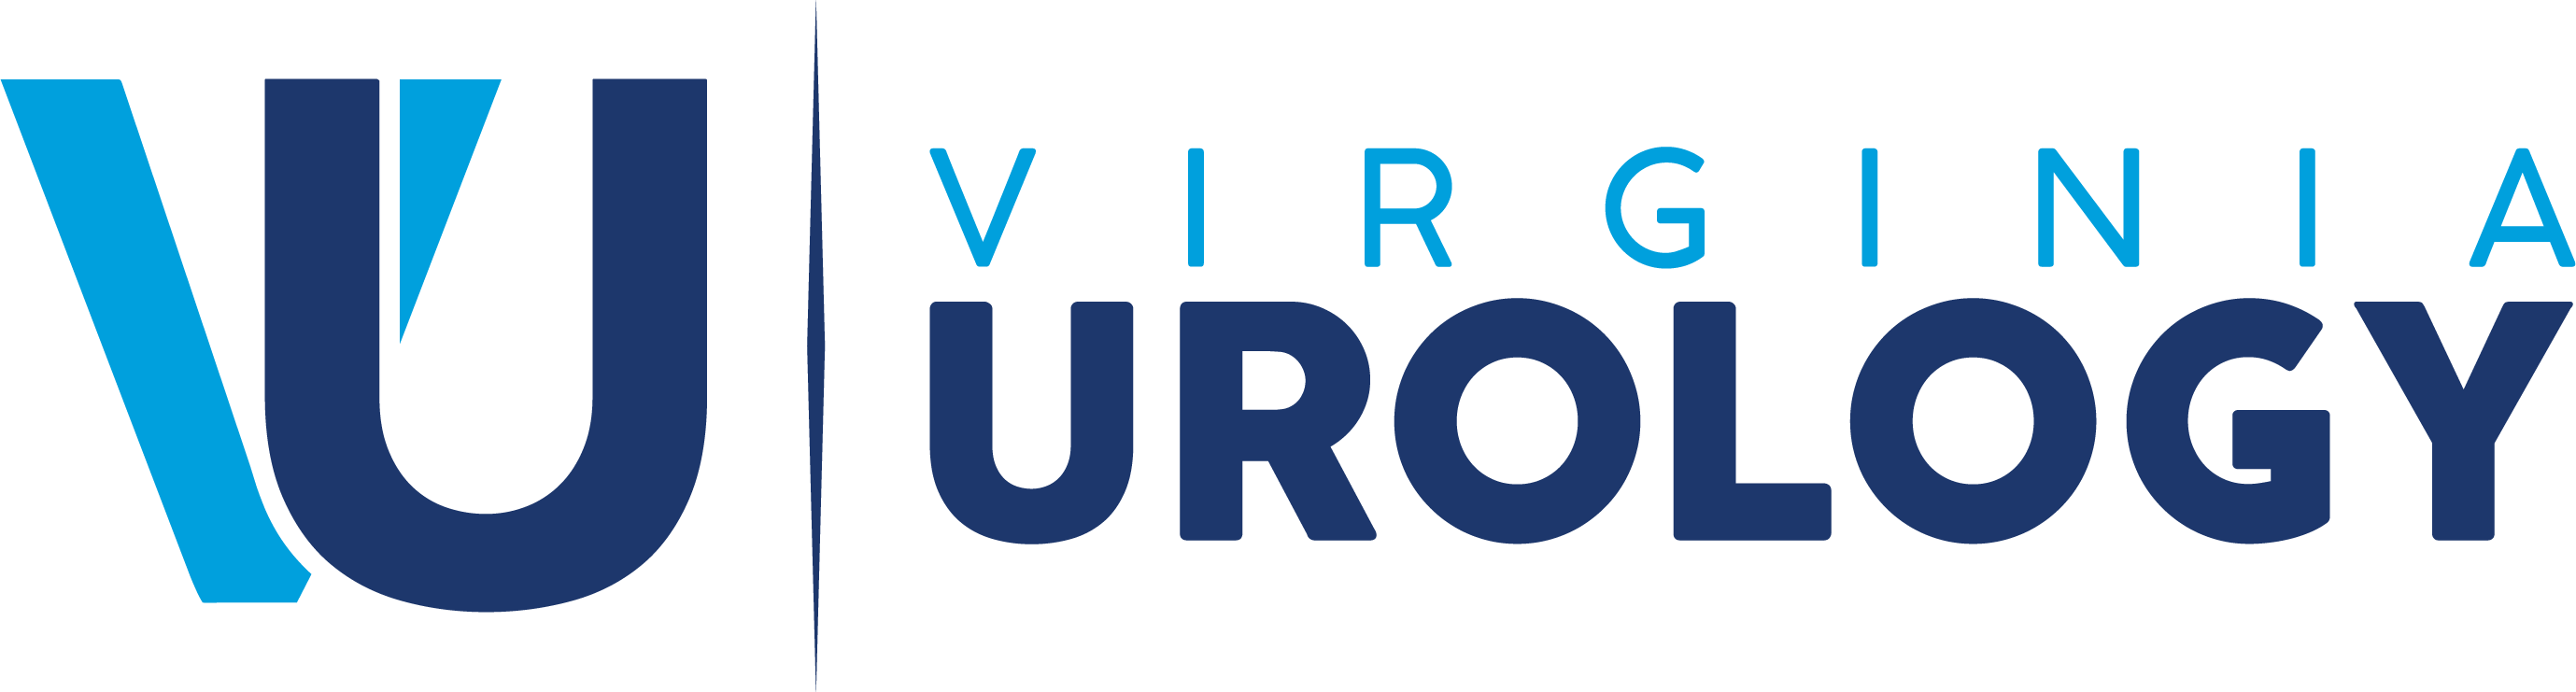 Virginia urology